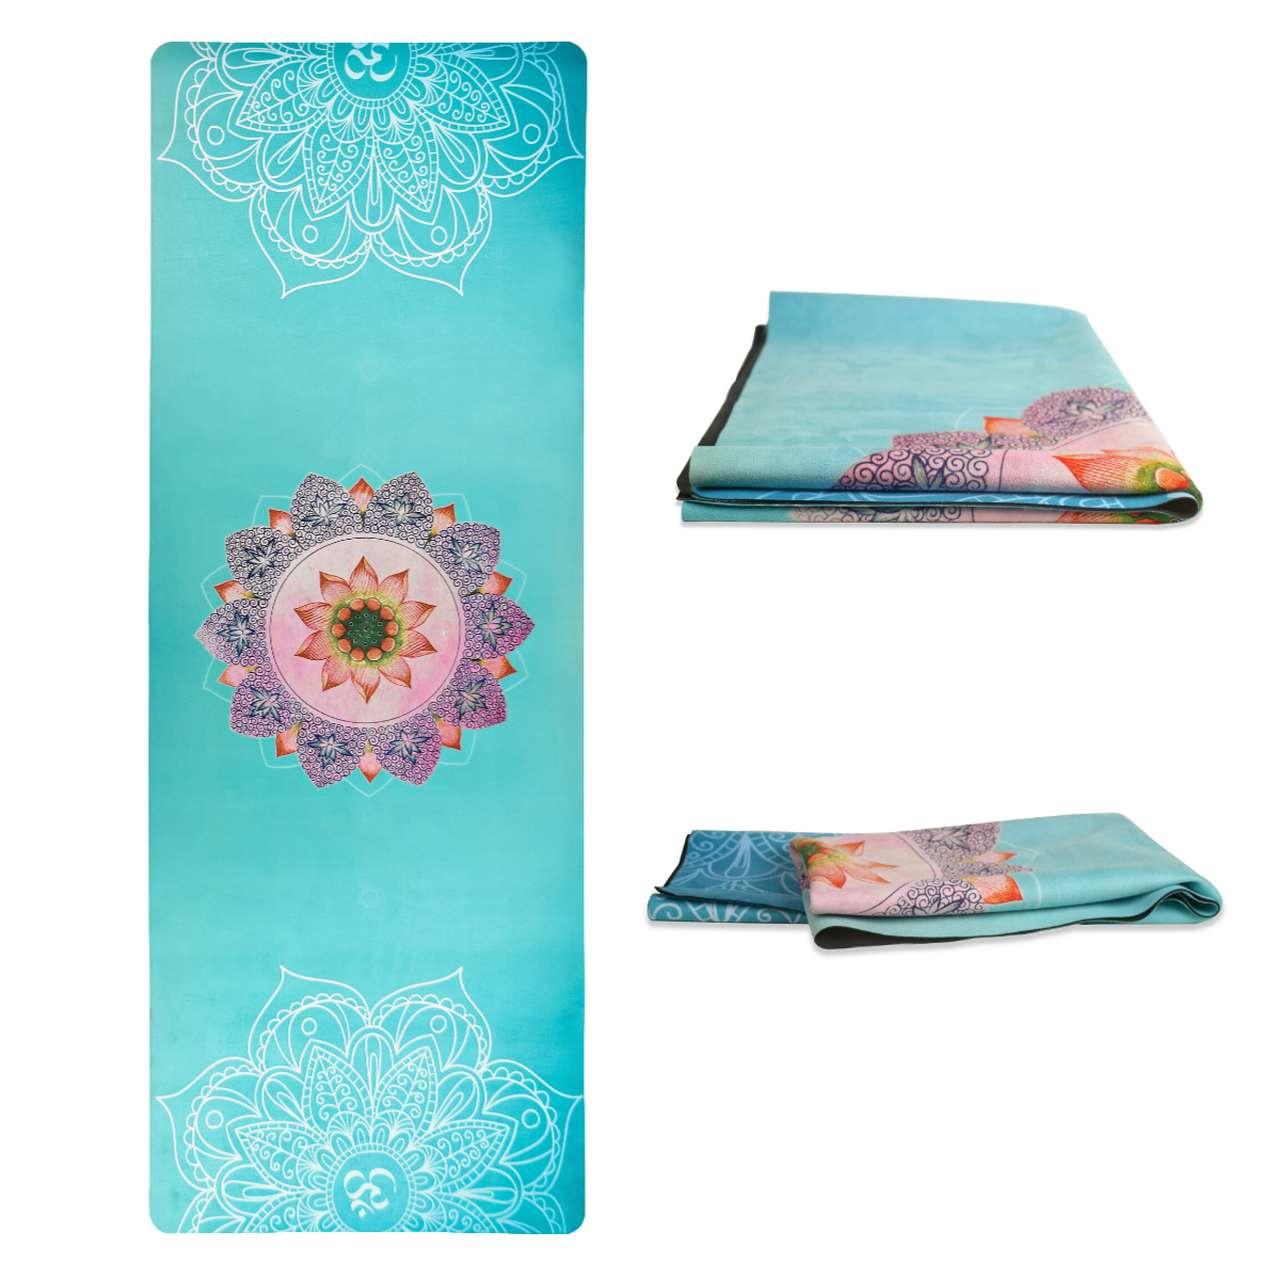 Tapete Yoga Dobrável Viagem Paz Interior - Aveludado + Borracha Natural 1,5mm